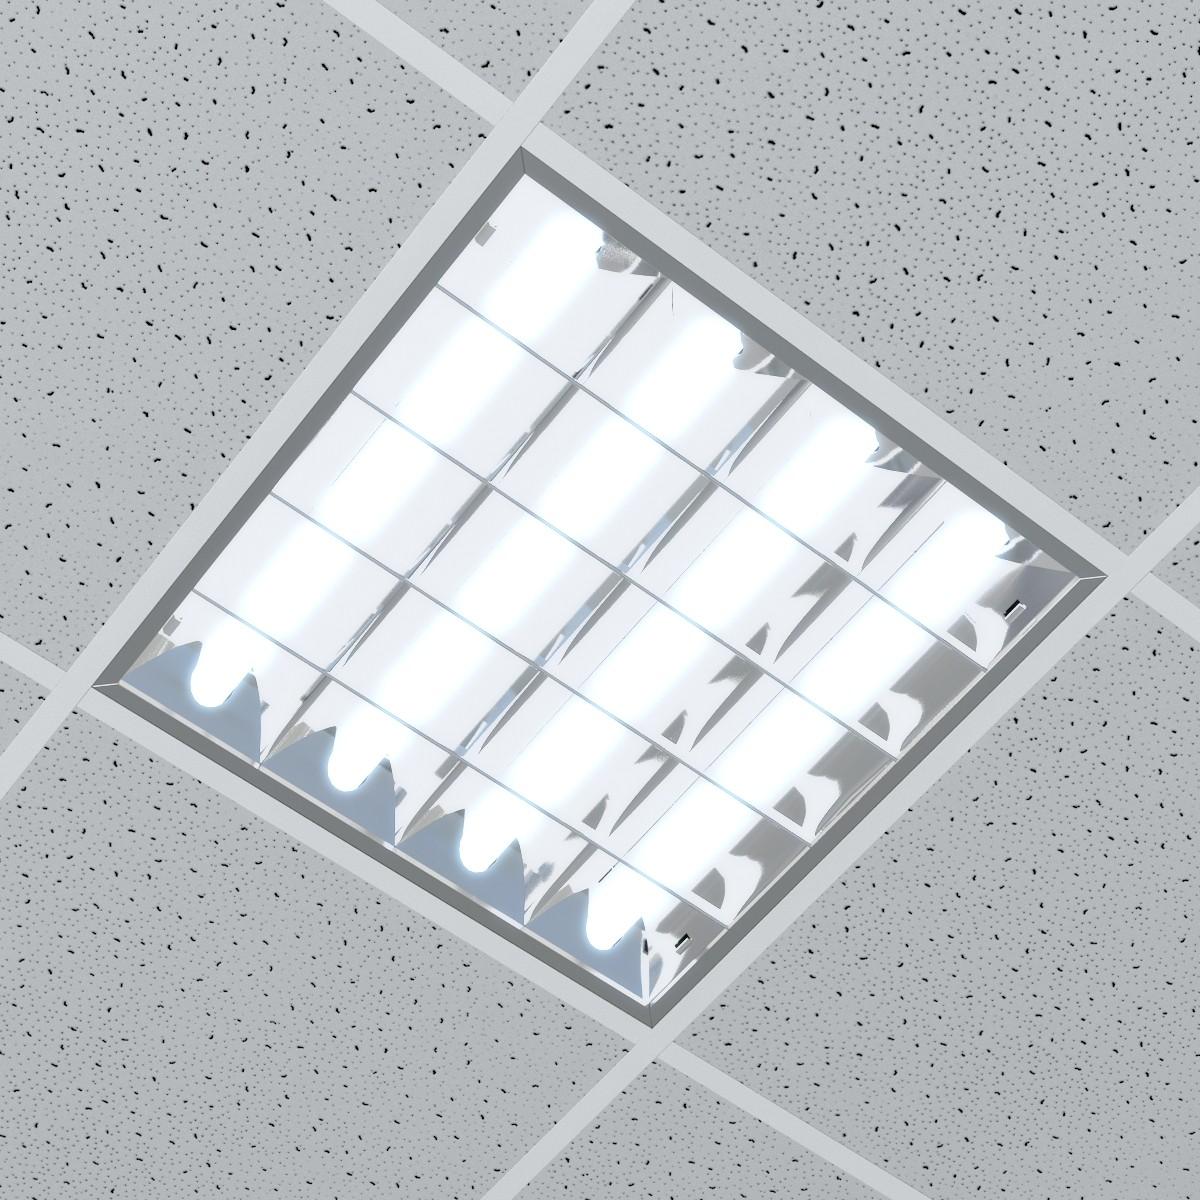 LED Office Ceiling Lights